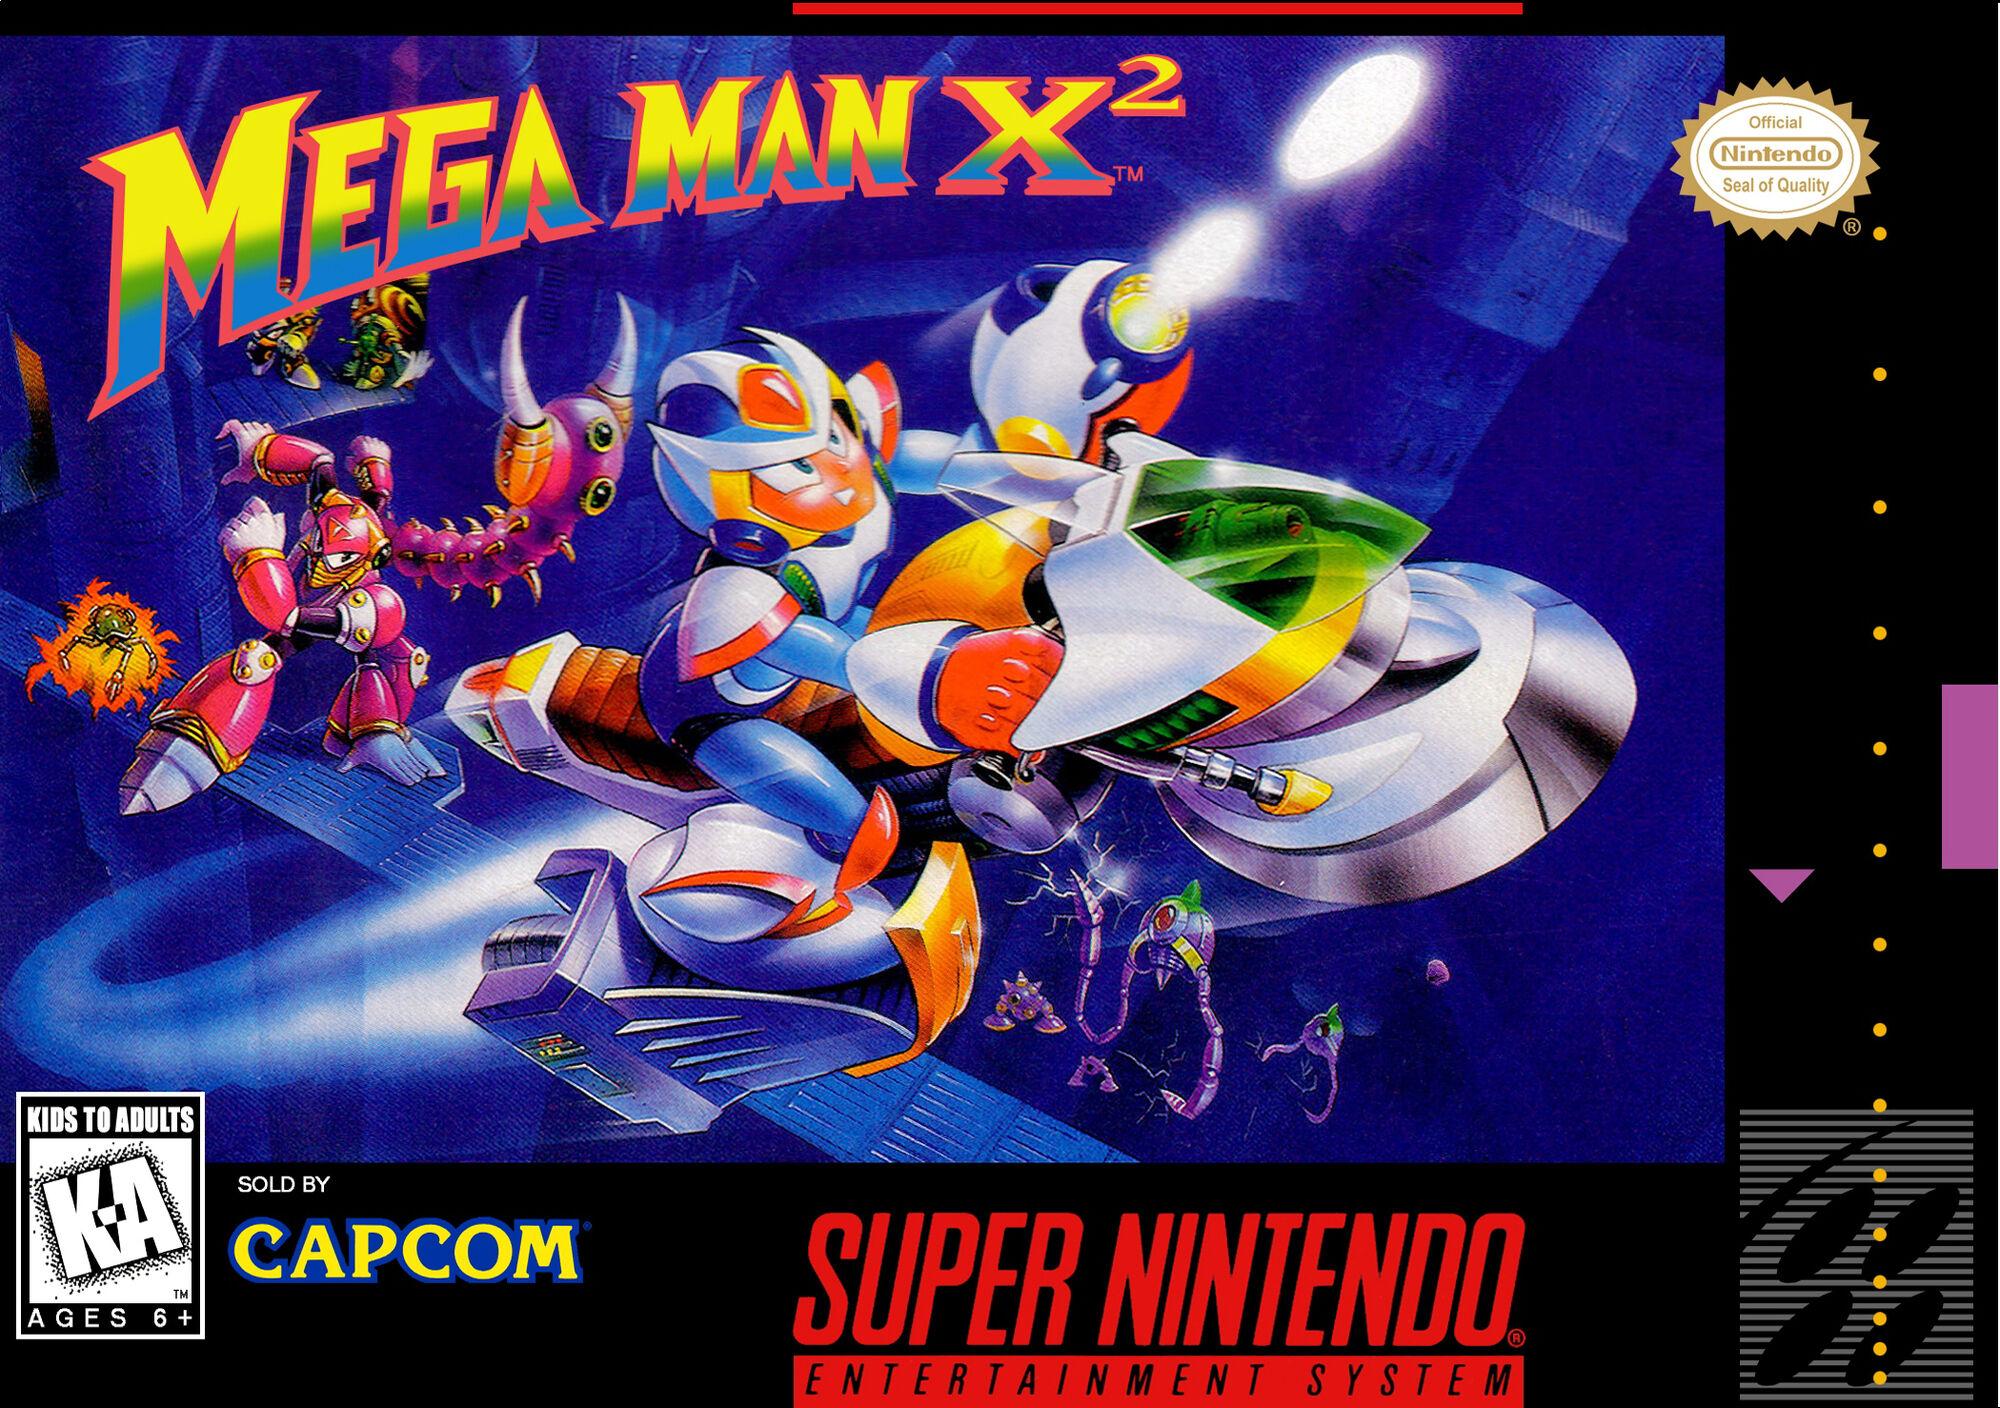 Image Mega Man X2 Box Art Jpg Mmkb Fandom Powered By